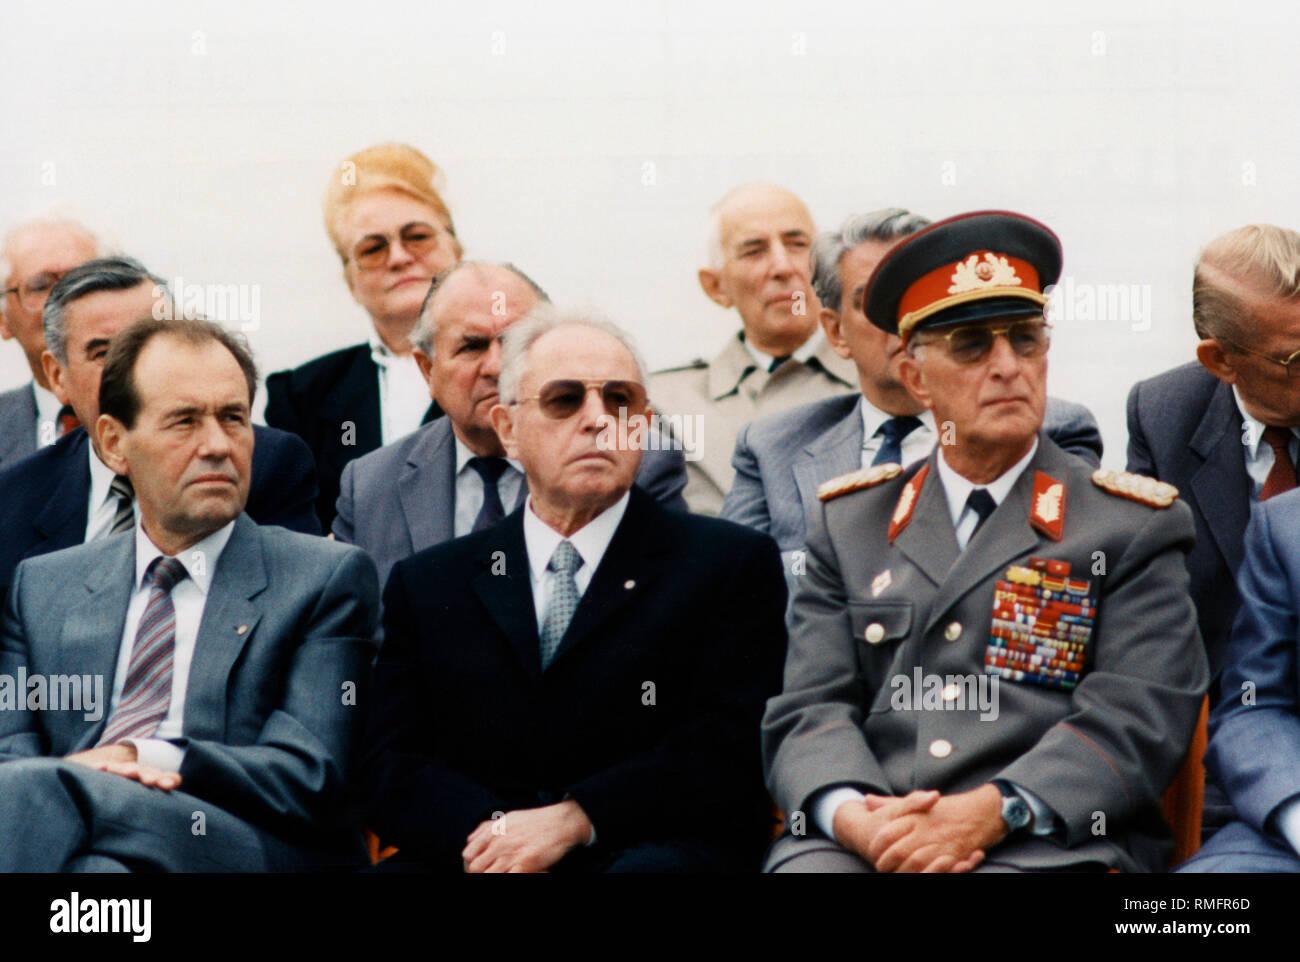 Politburo member Joachim Herrmann, Stasi chief Erich Mielke and Defense Minister, Army General Heinz Kessler (front from left) before a mass rally on Bebelplatz in Unter den Linden Strasse. - Stock Image